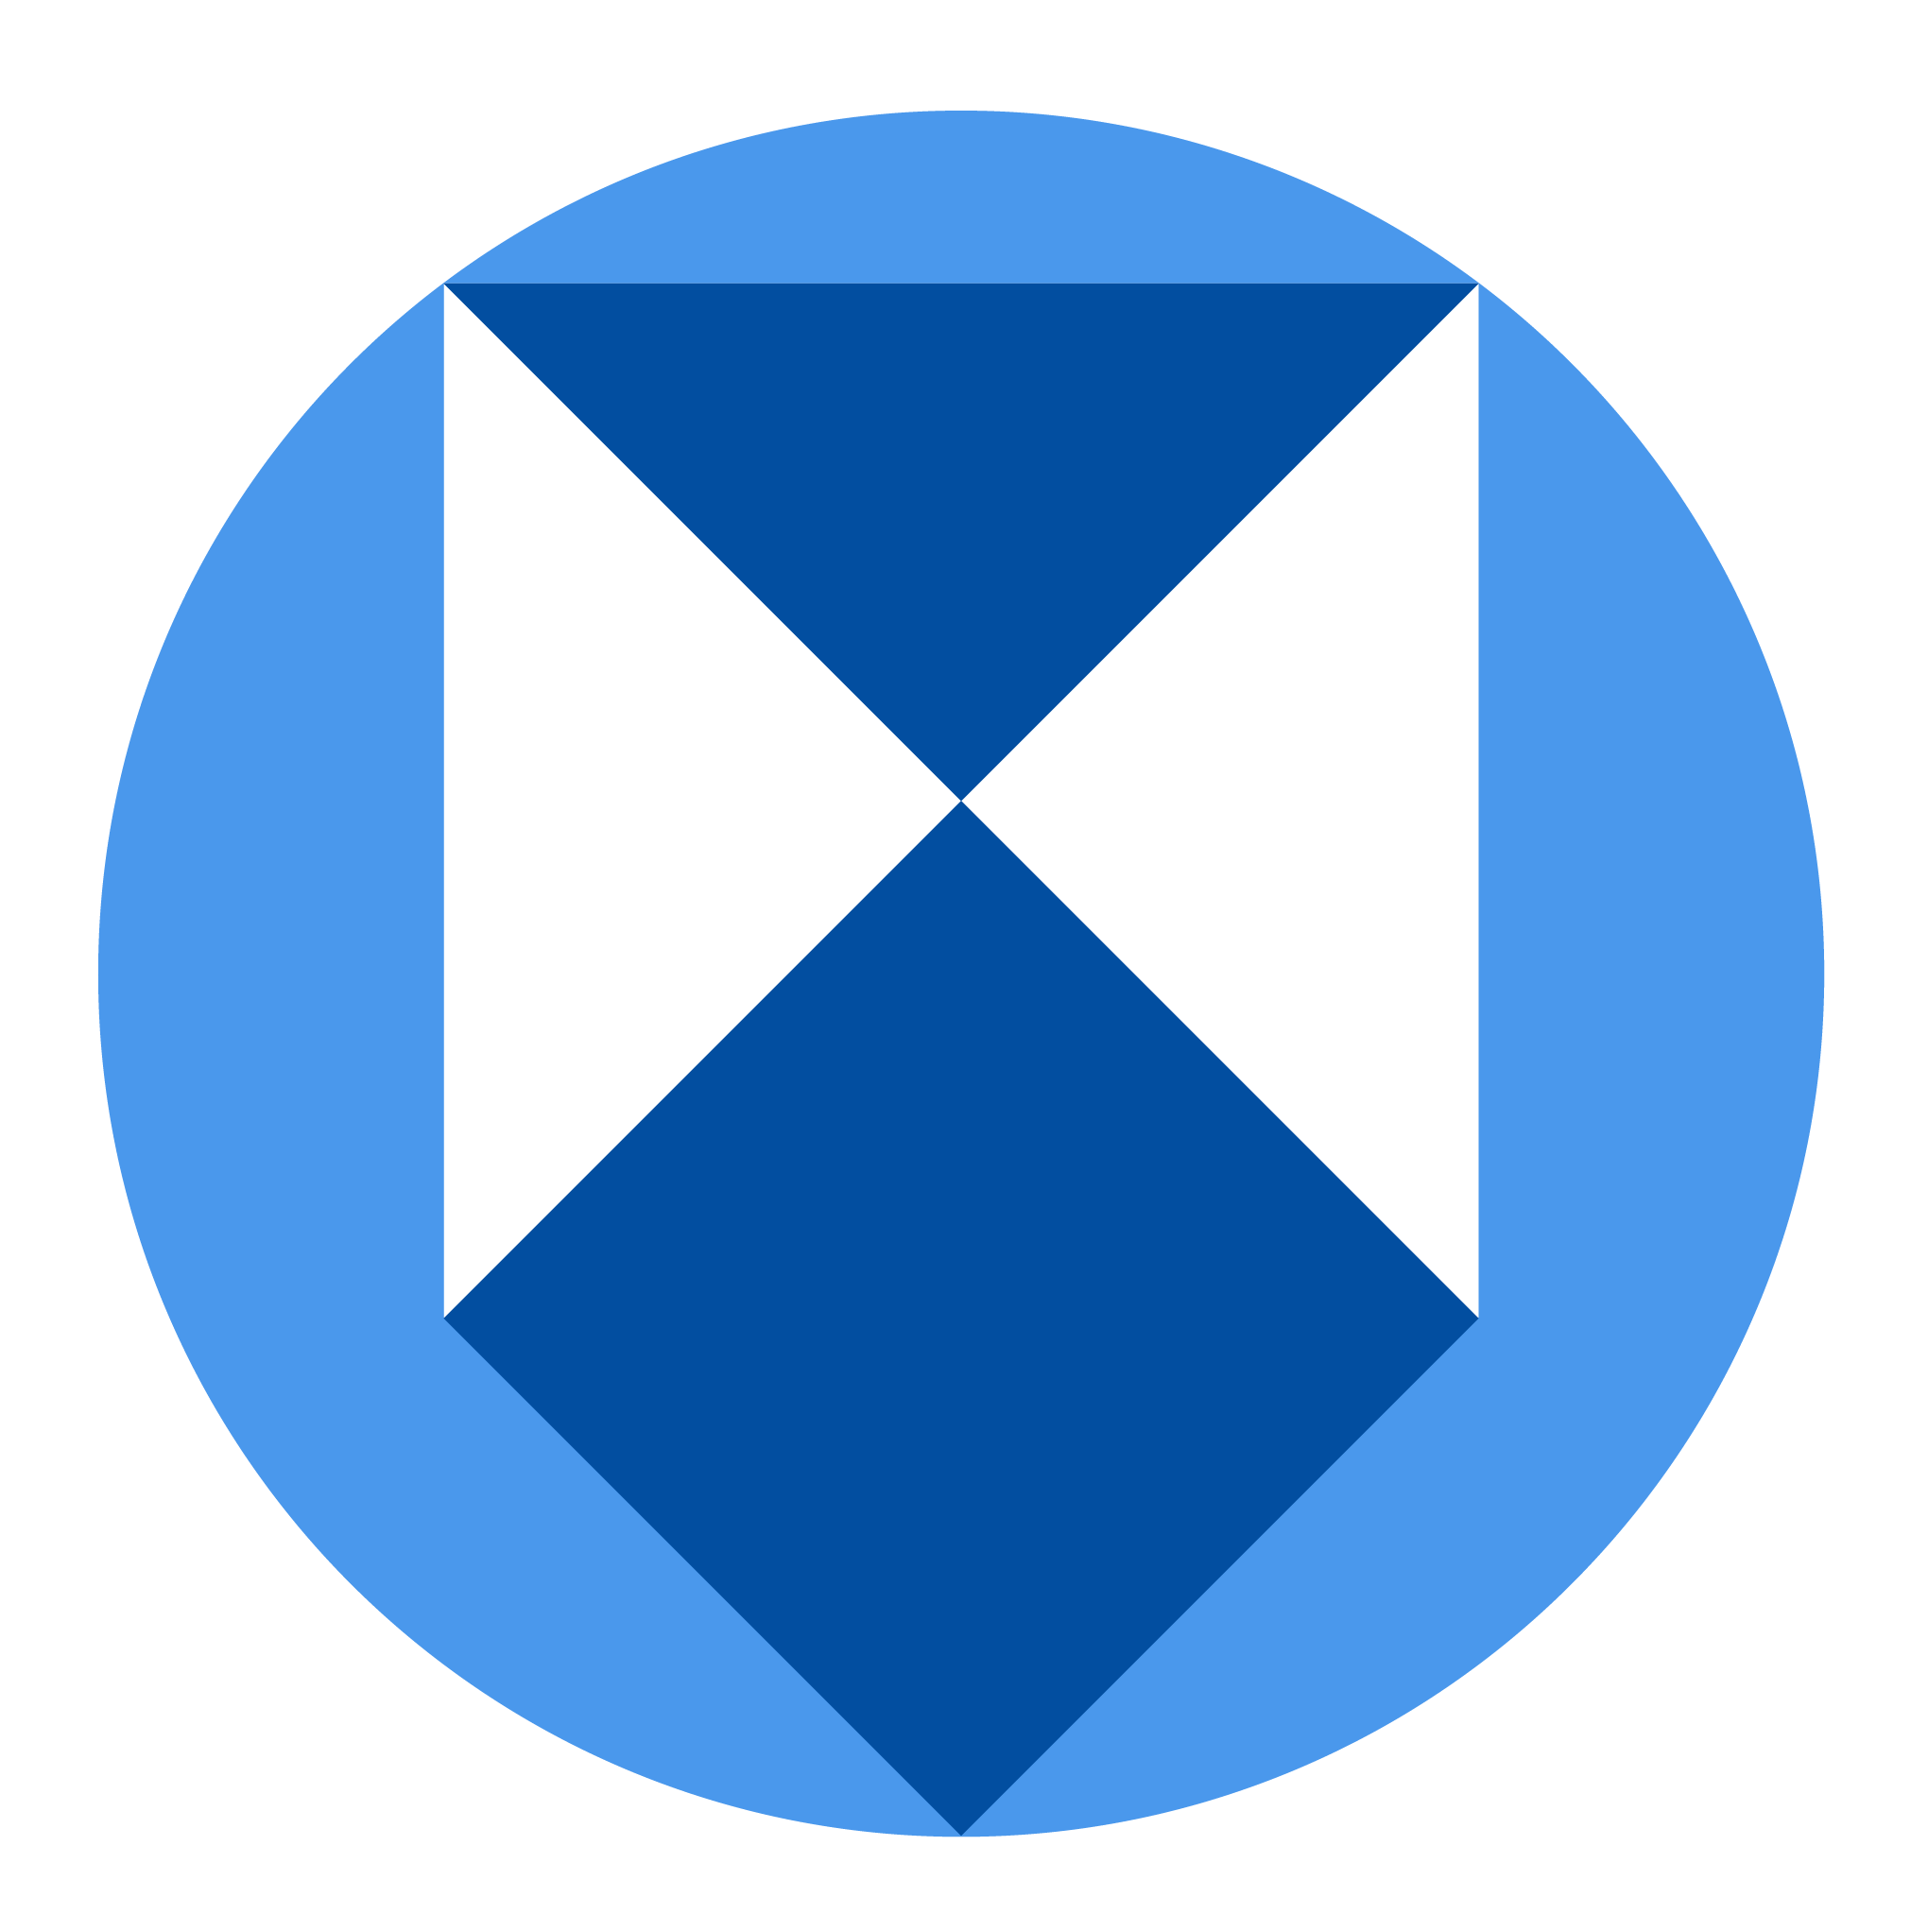 Den norske Blue Shield komiteen